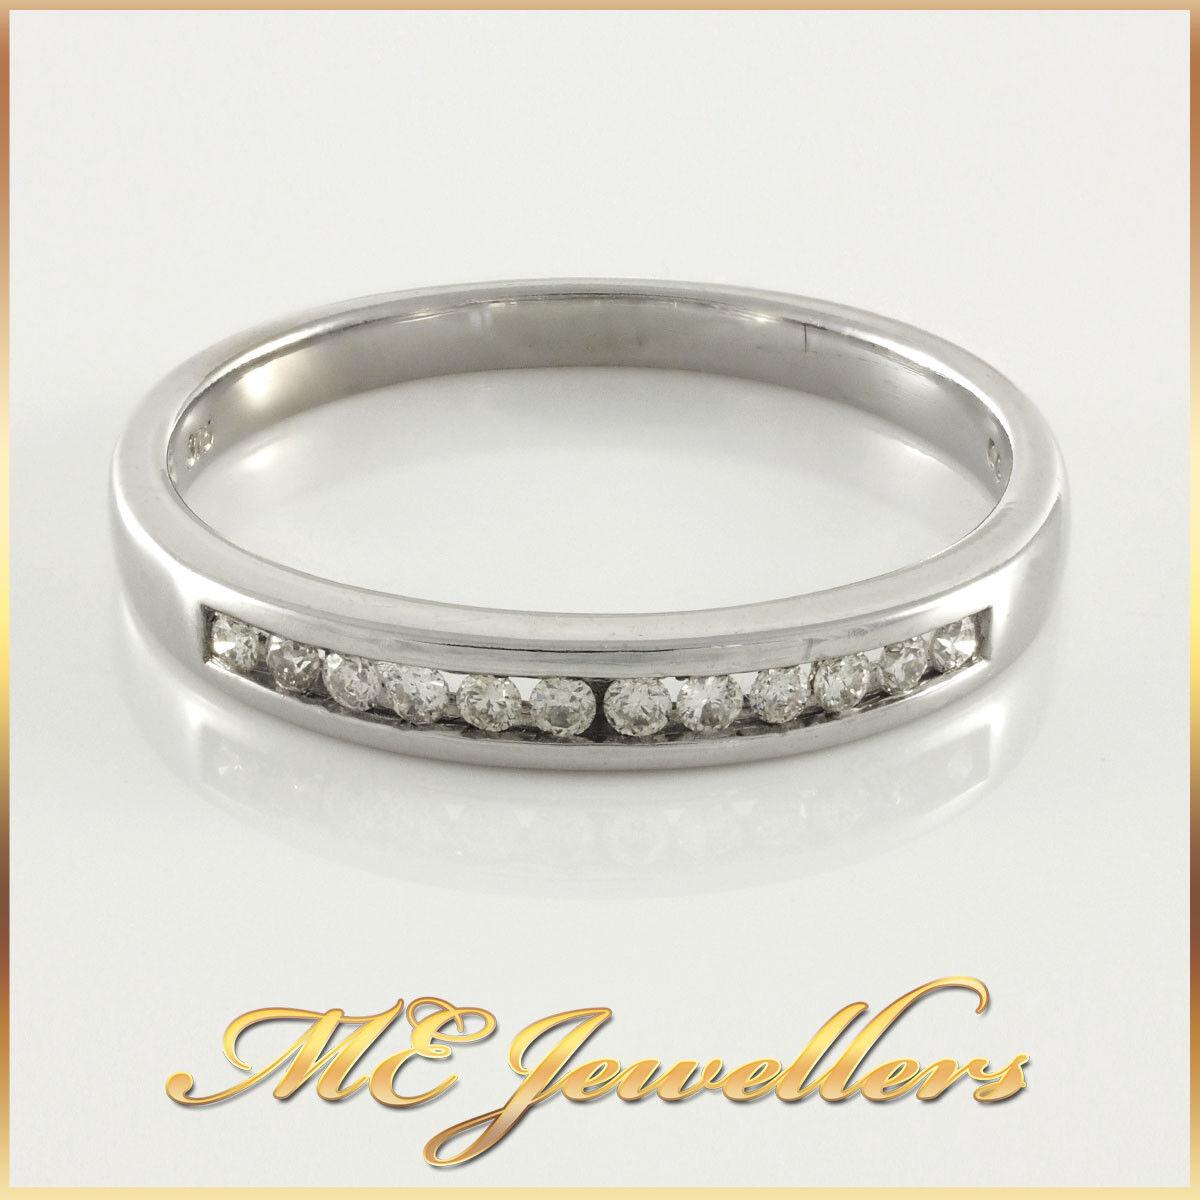 LadieS Solid White gold 0.12ct TDW Diamond Ring 9k 9kt 9ct 375 Sz O, 2-2.9mm